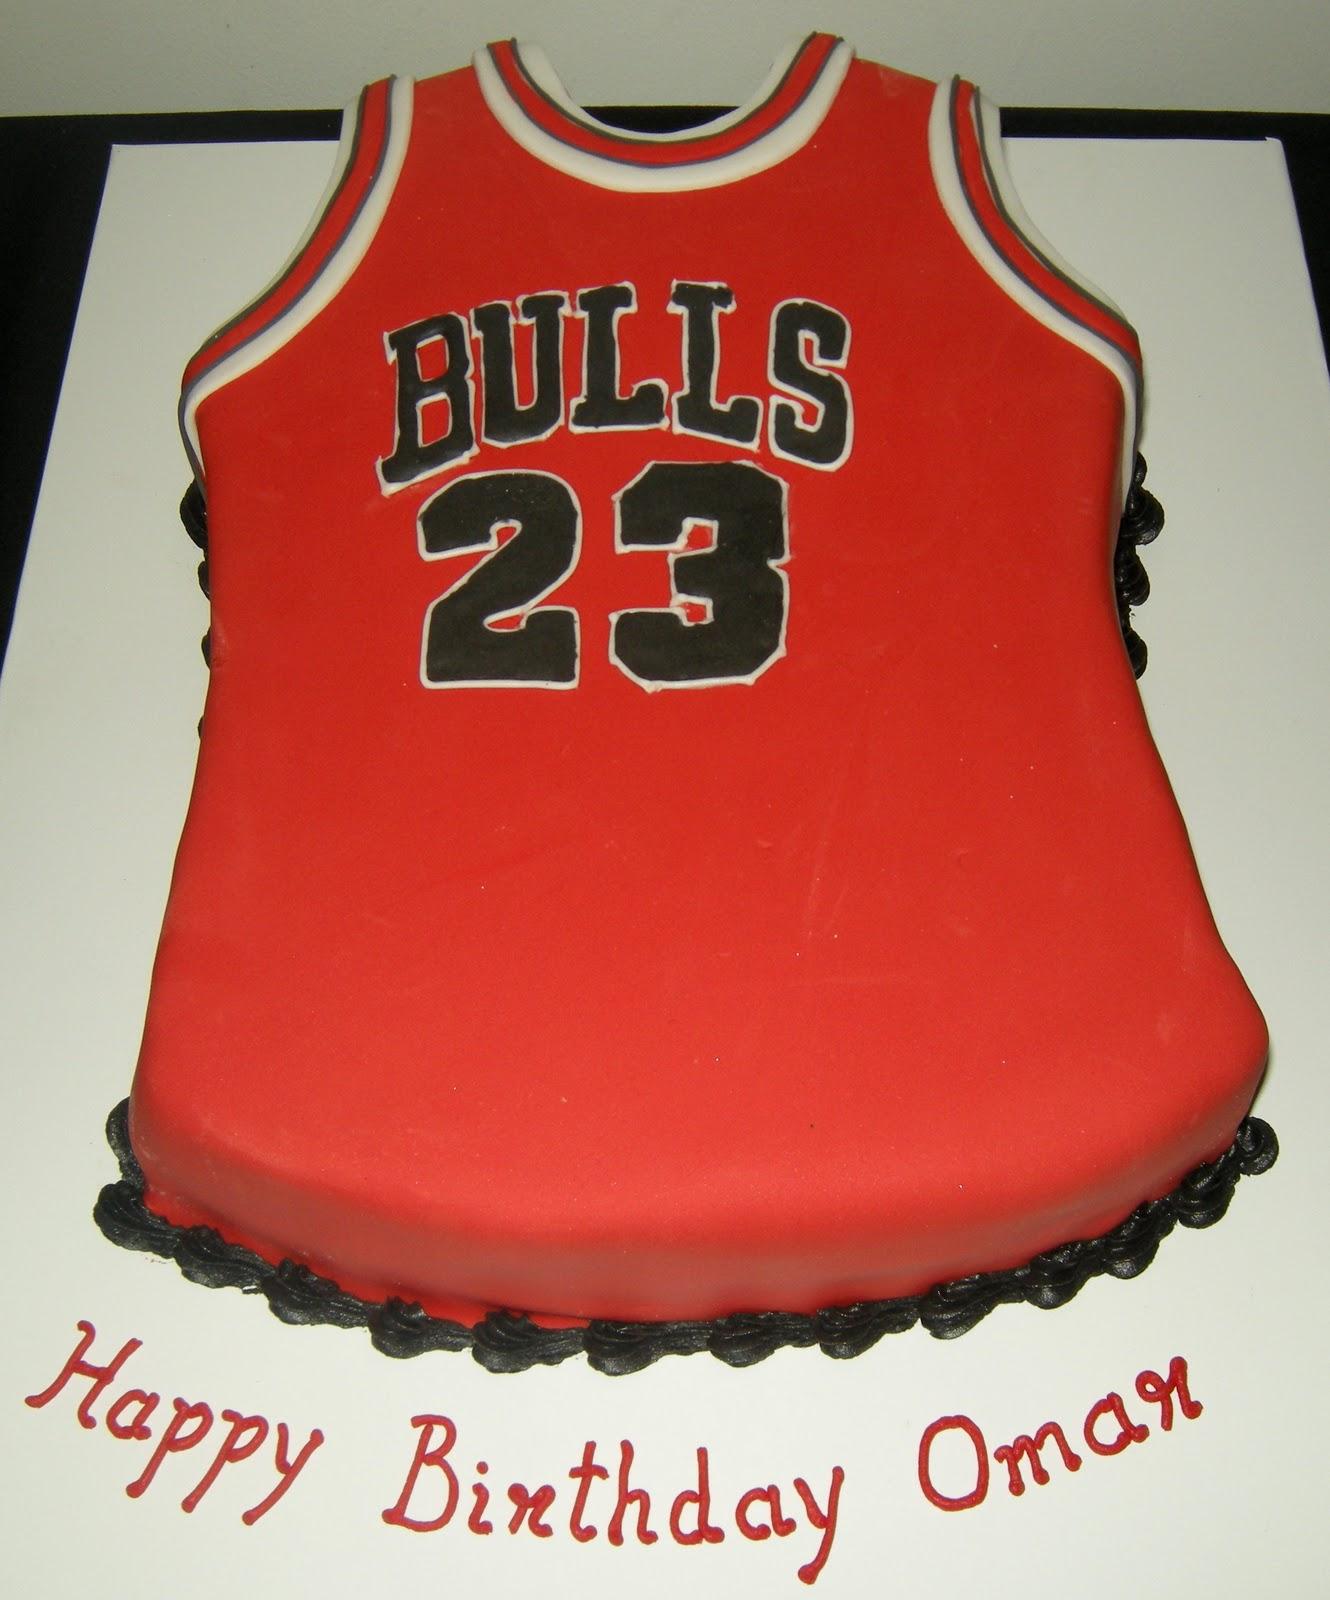 Harshi's Cakes & Bakes: Bulls Basketball Jersey